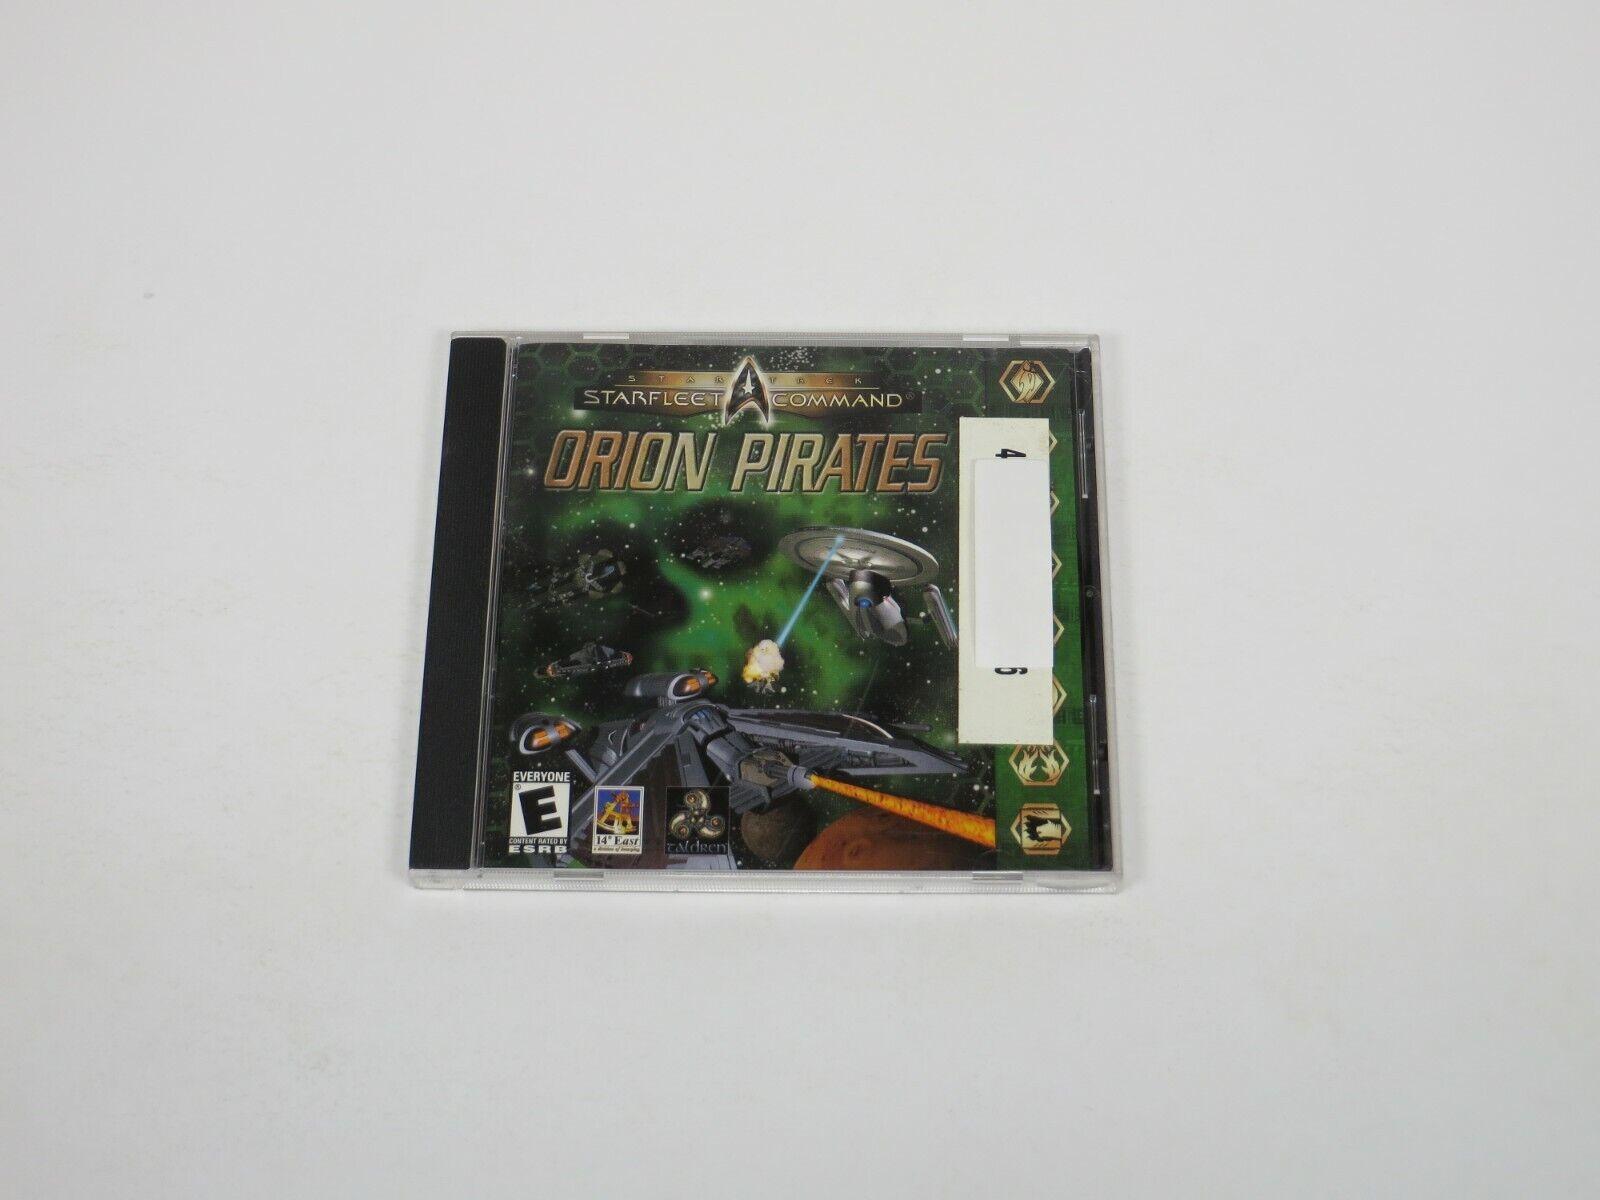 Computer Games - Star Trek: StarFleet Command Orion Pirates (PC, 2001) PC Computer Game Interplay